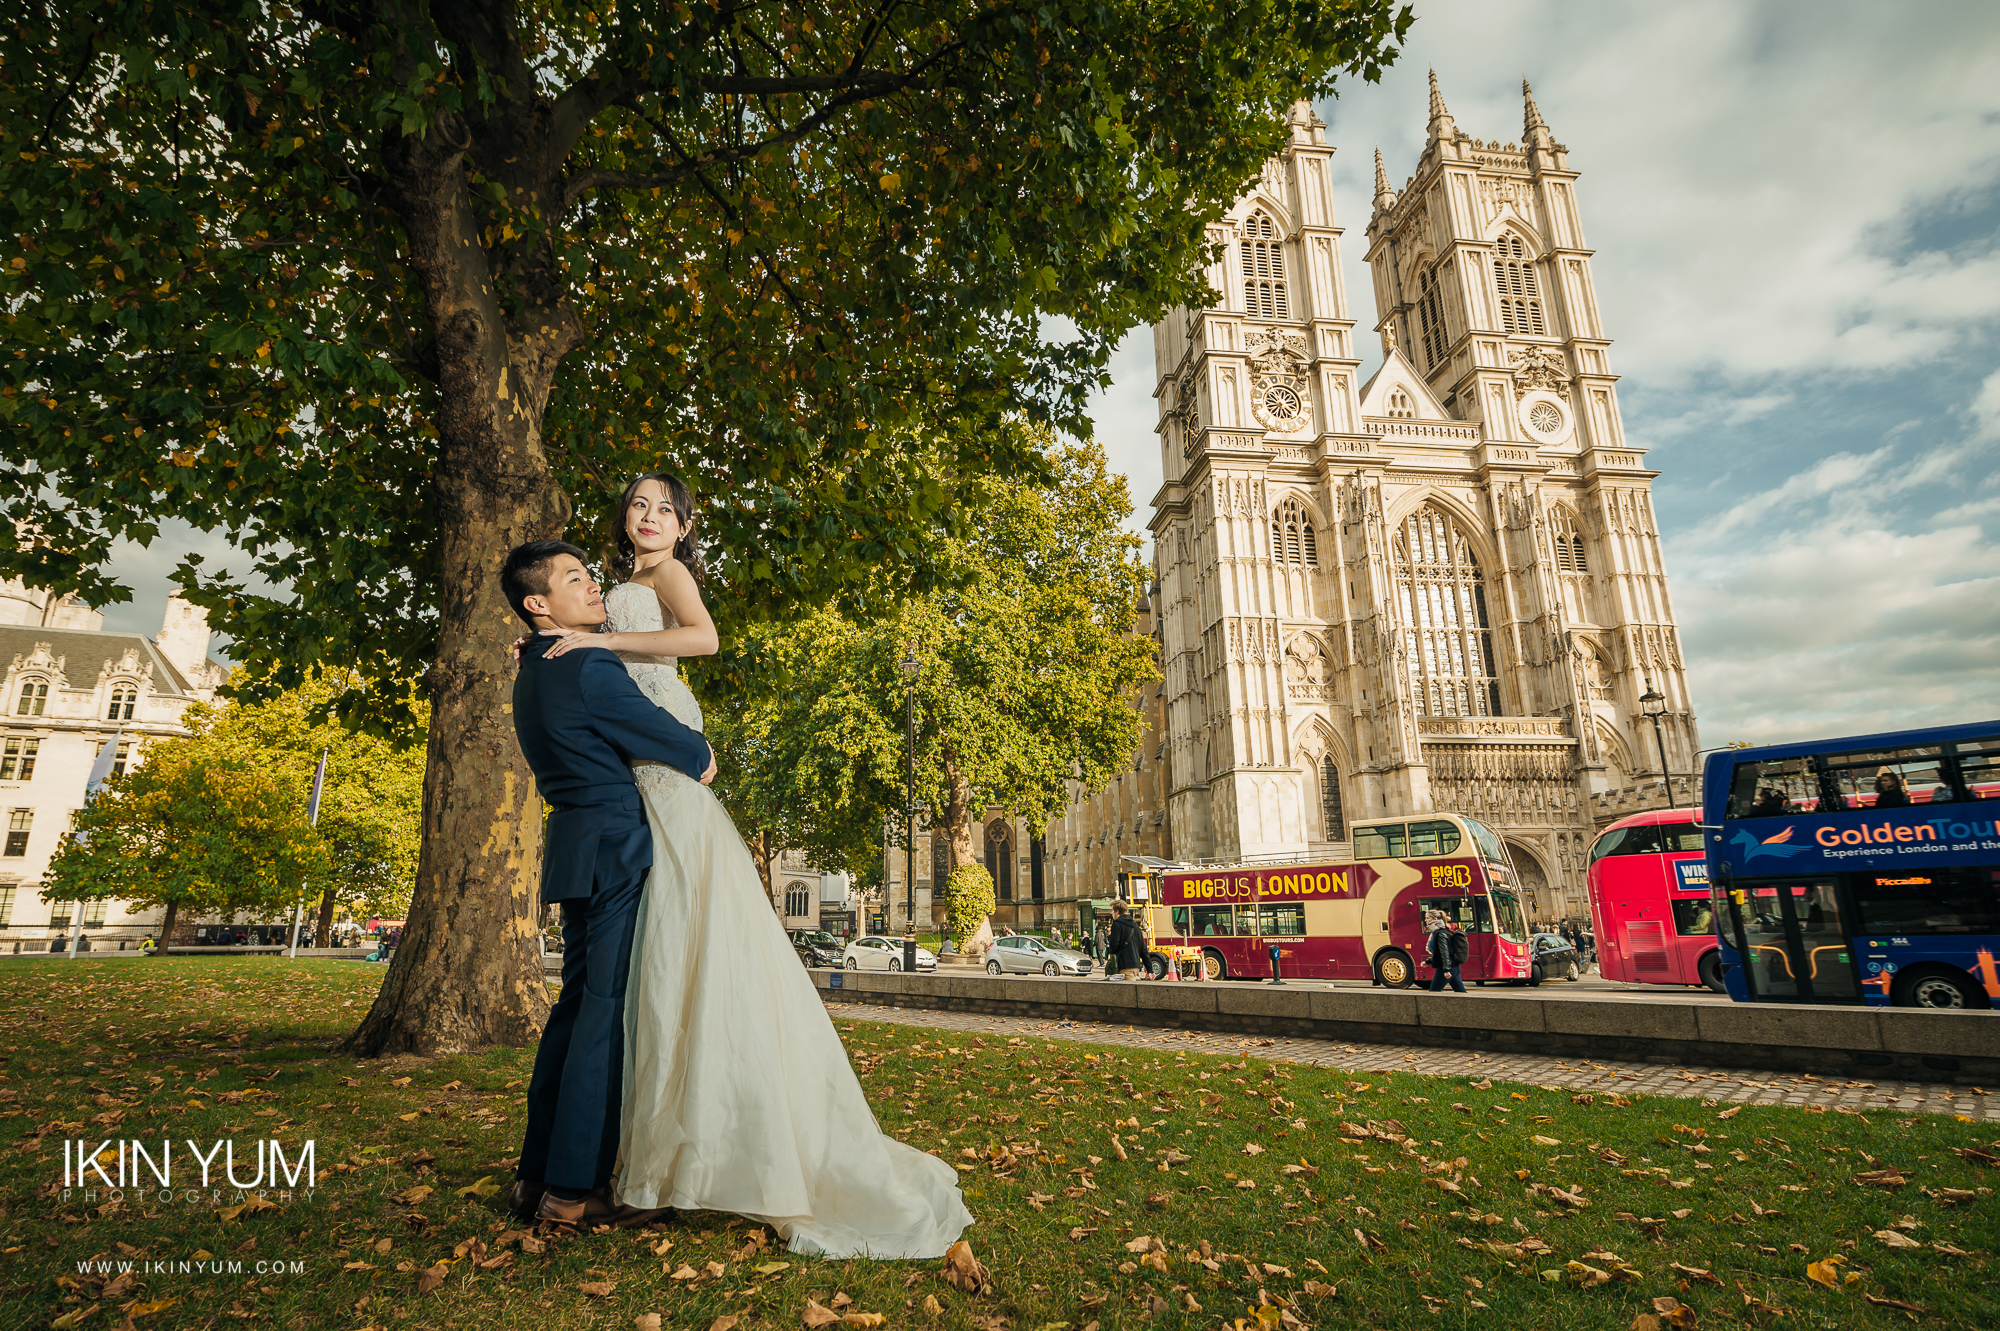 London Pre-Wedding Shoot - Westminster Abbey -  英国伦敦婚纱摄影